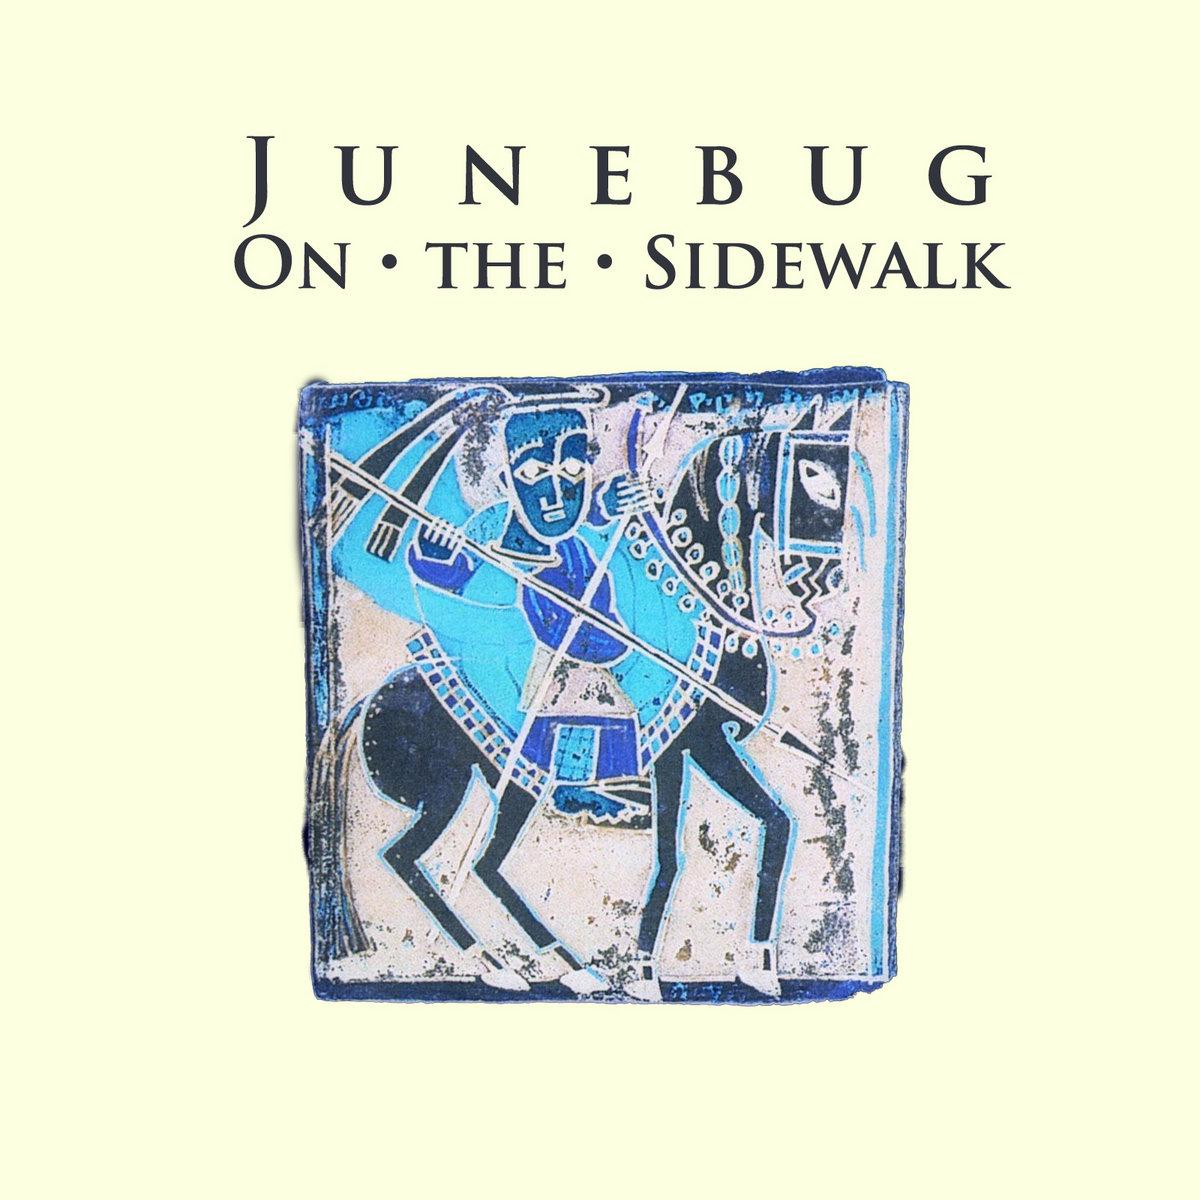 On the Sidewalk (single) by Junebug